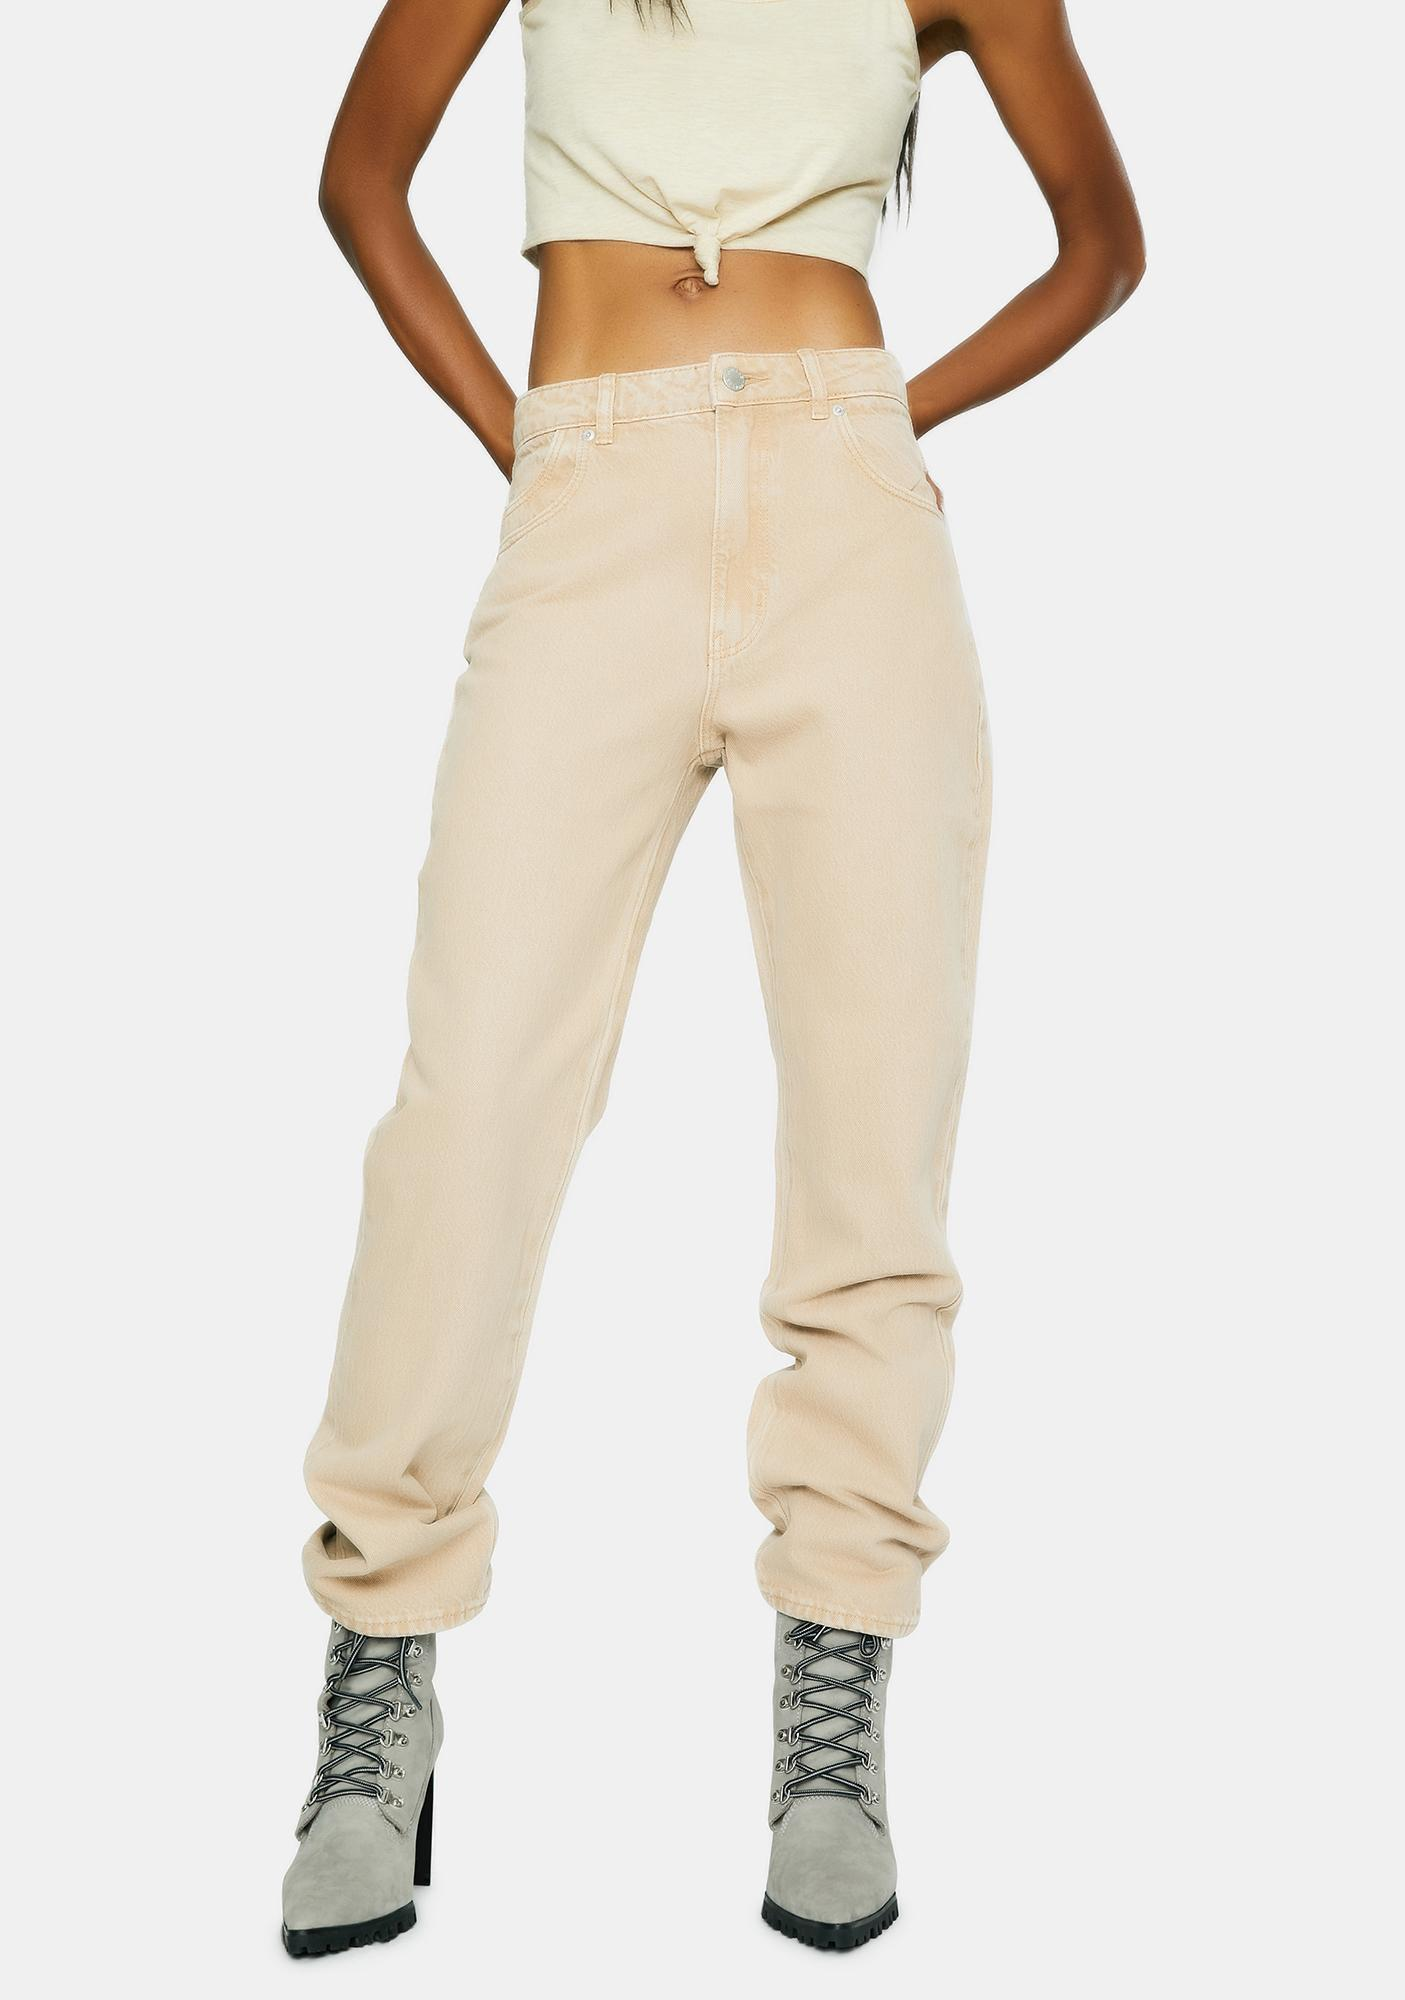 Rollas Sand Original Straight Leg Denim Jeans